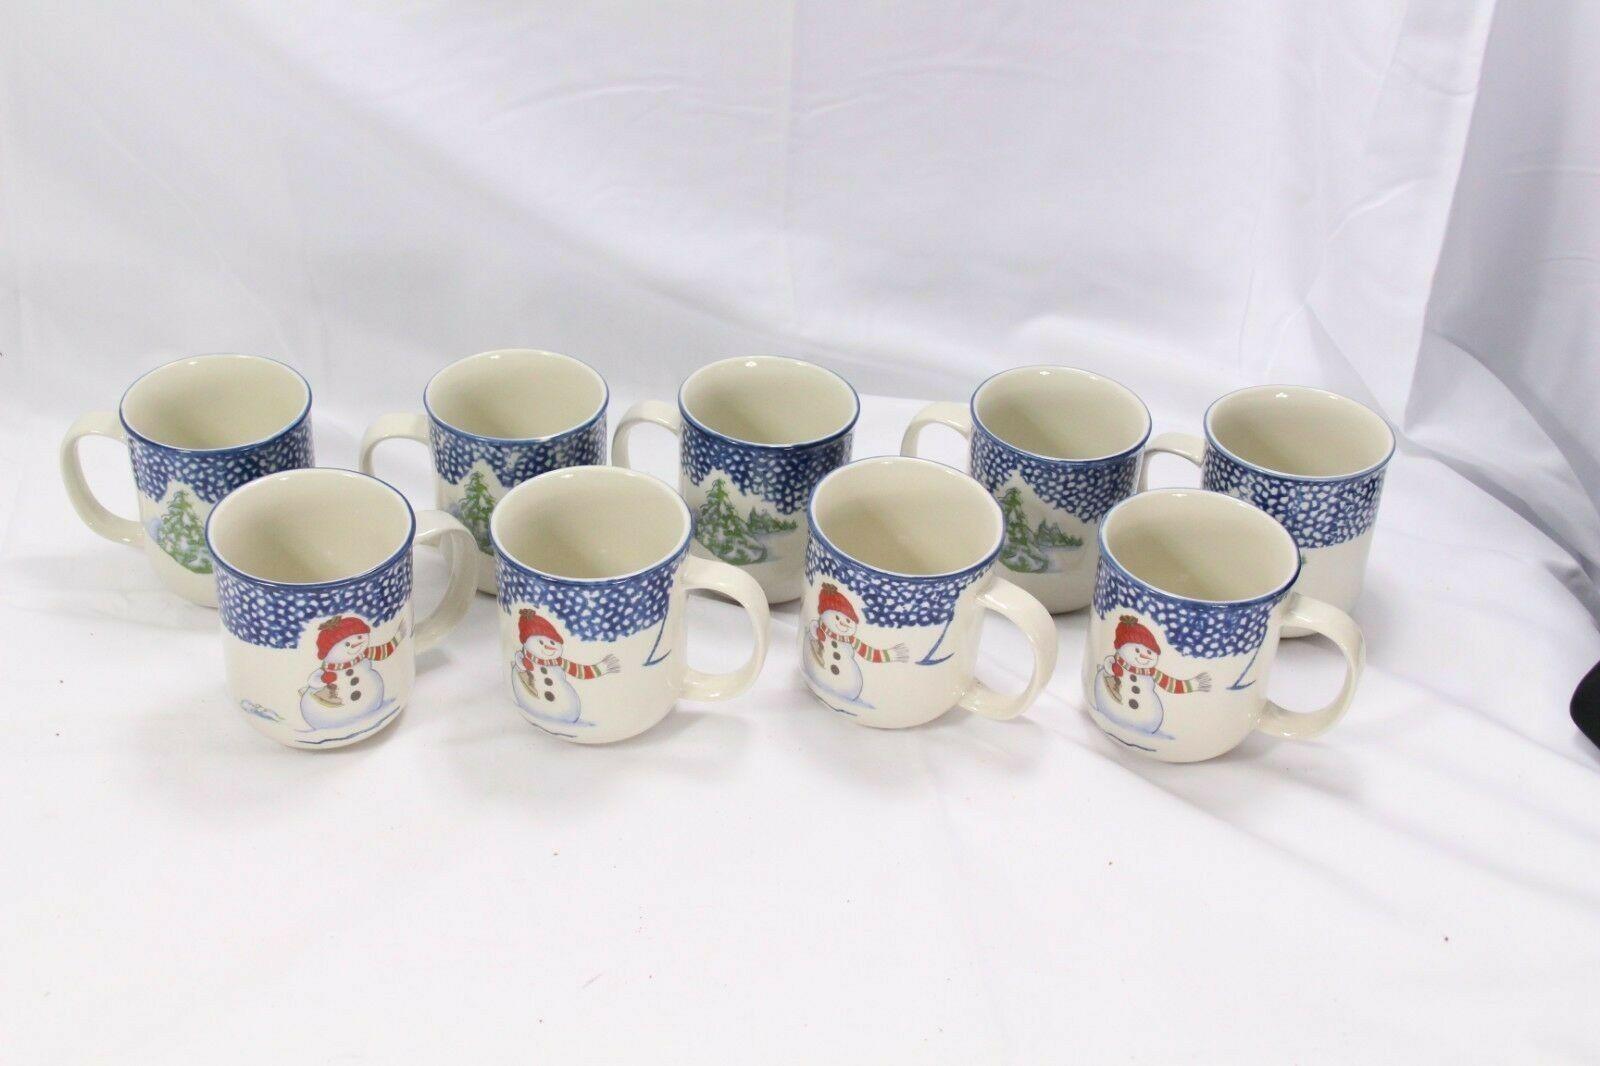 Thomson Pottery Snowman Xmas Mugs Lot of 9